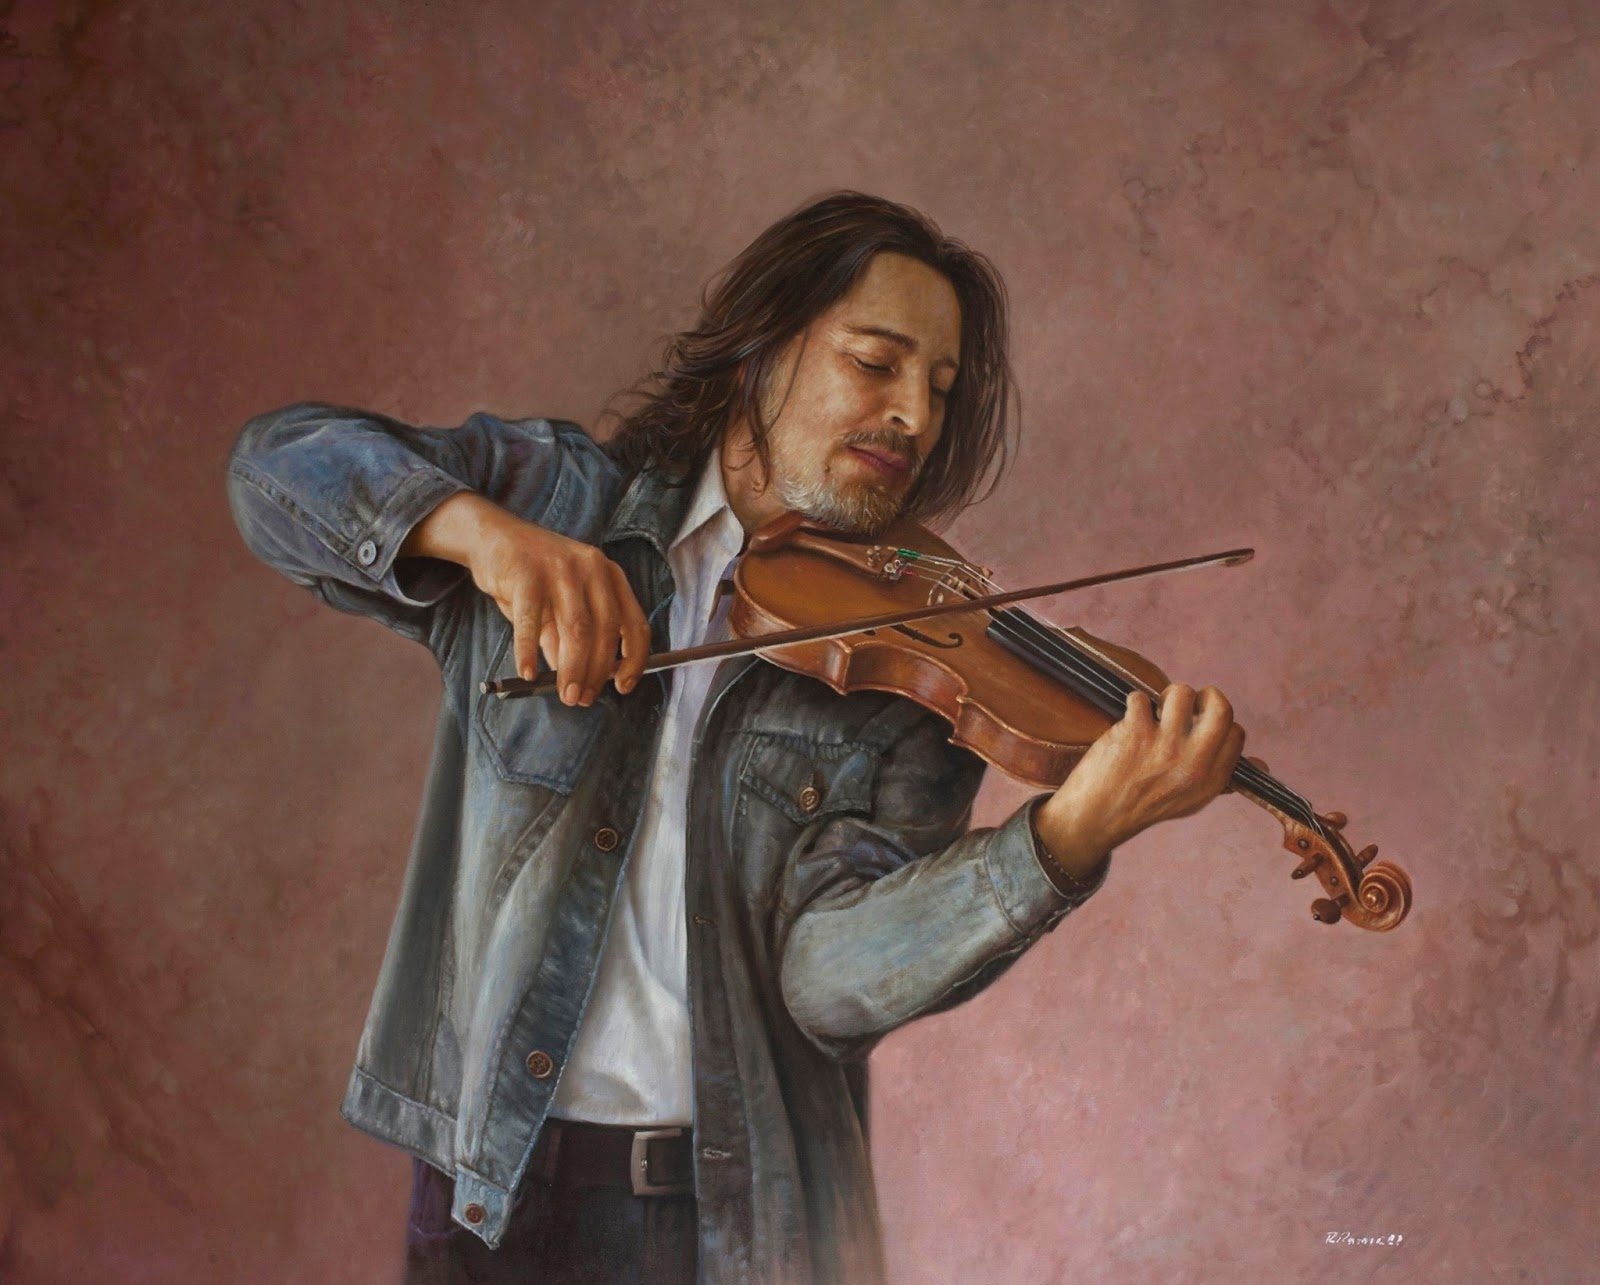 Ramiro Ram C ADrez Cardona Fabricio el violinista